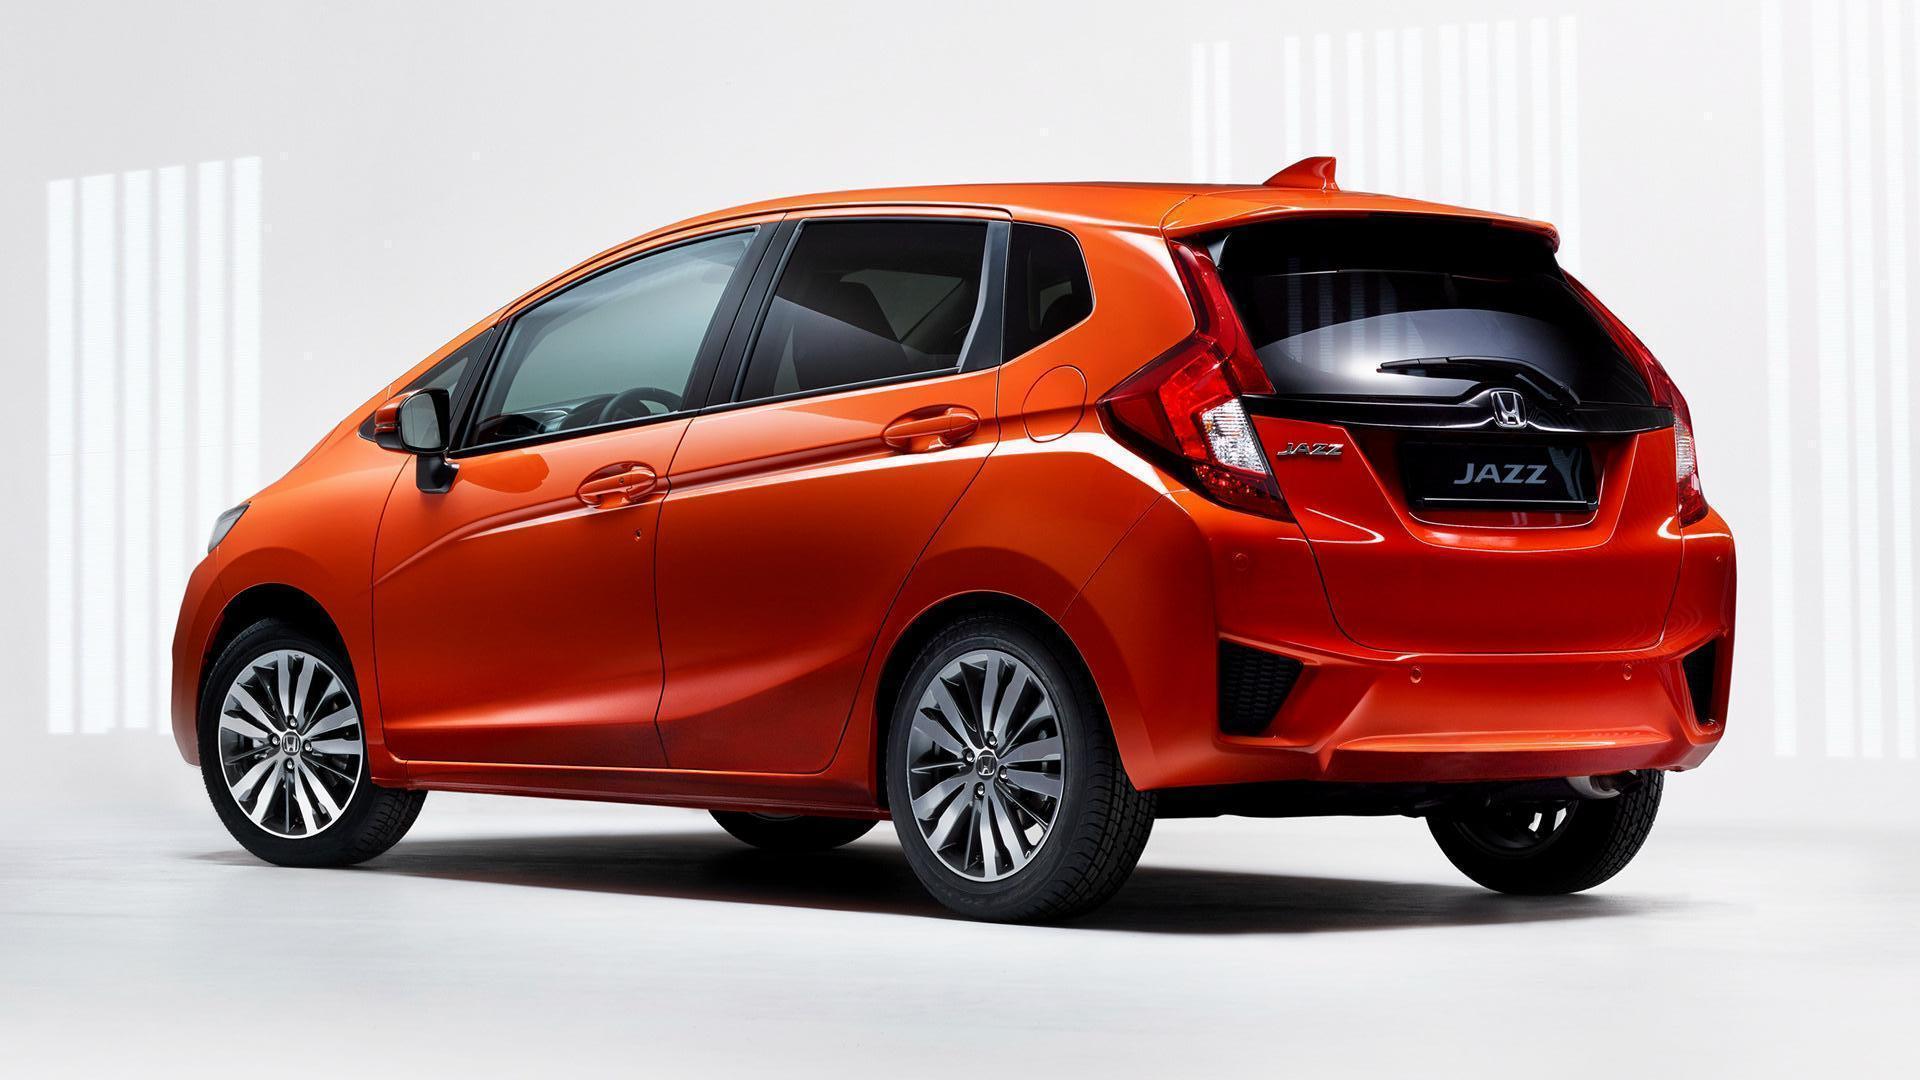 68 Gambar Mobil Honda Jazz Tahun 2014 HD